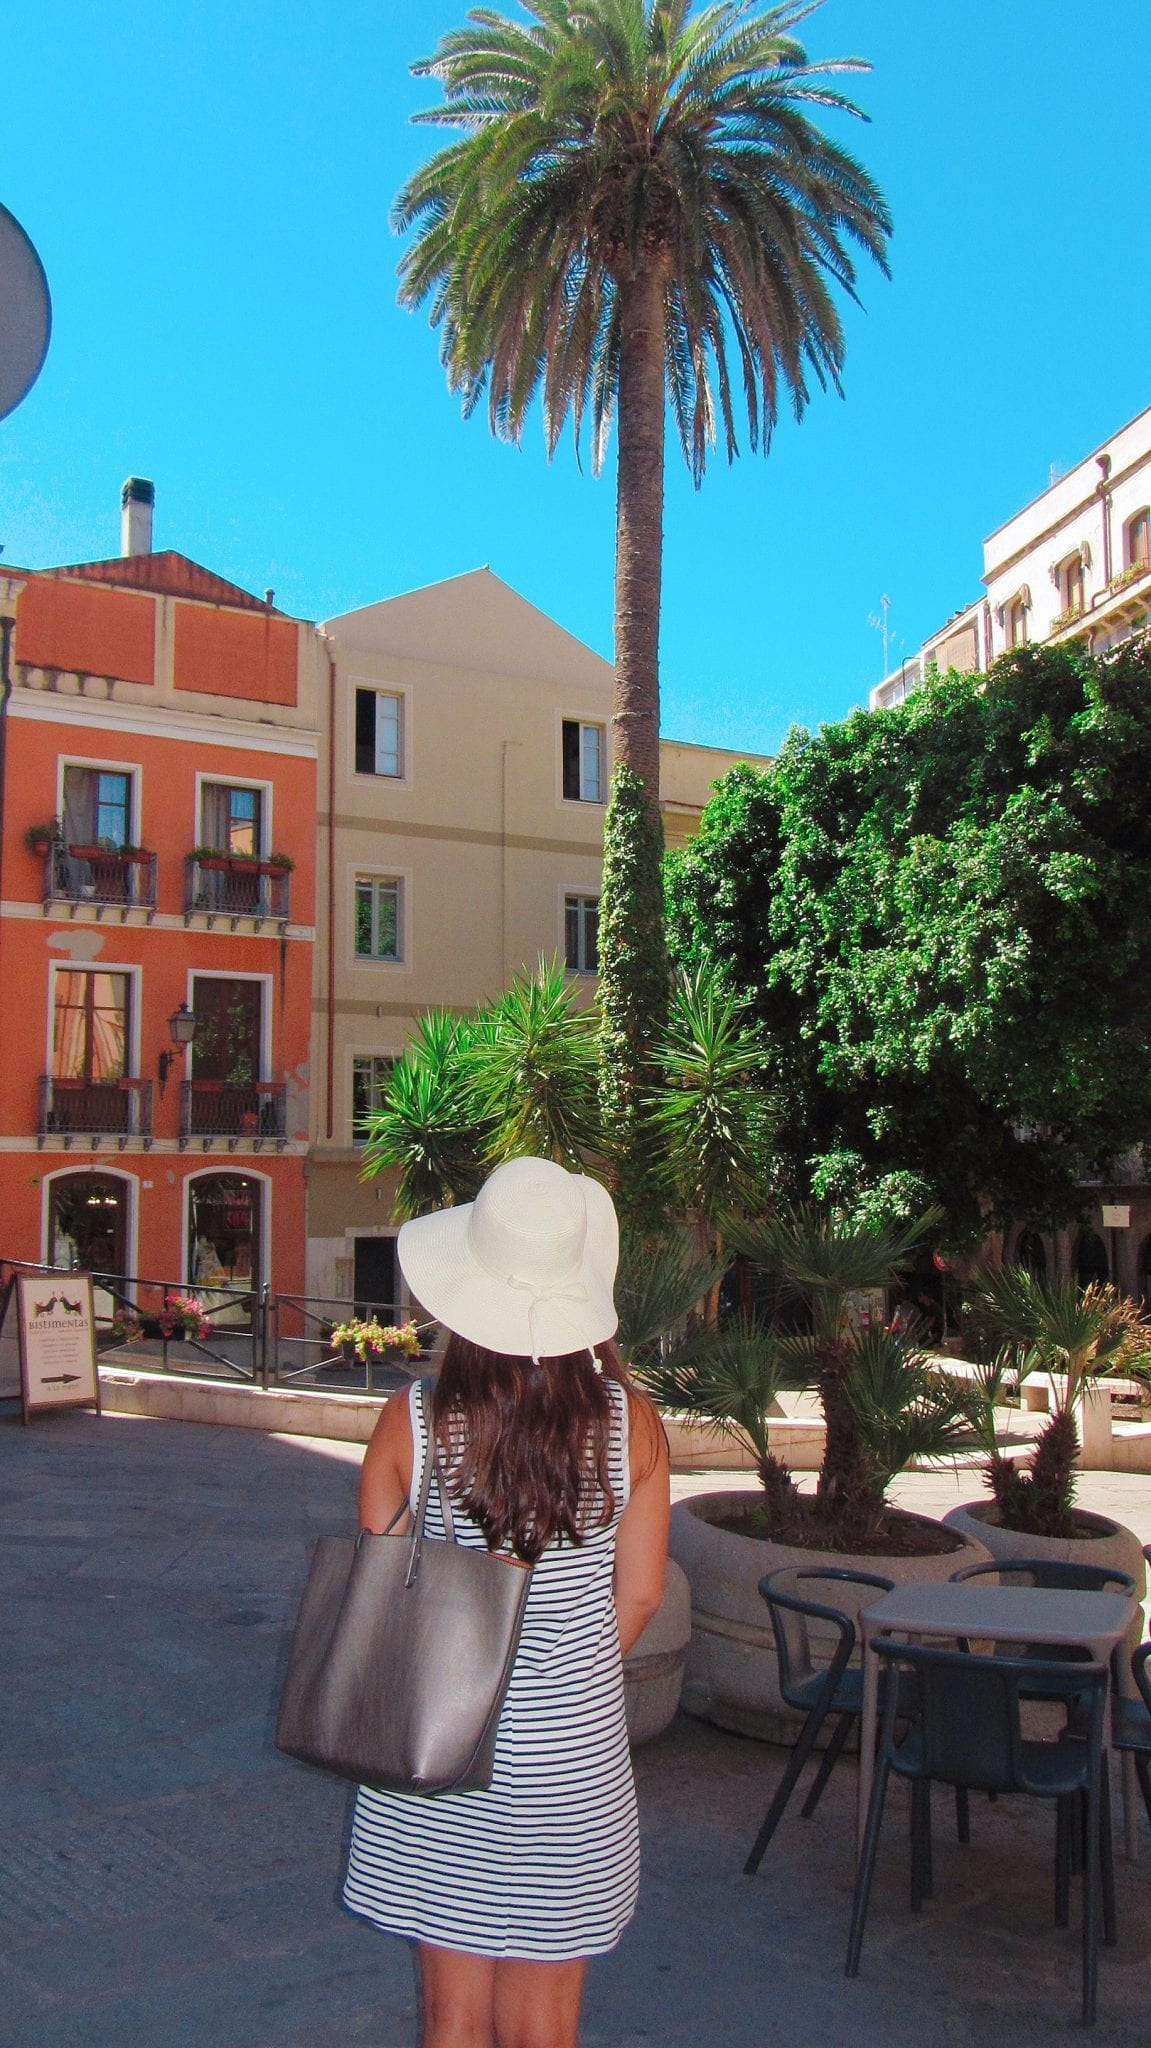 Piazza Savoia - Le Plume - City break